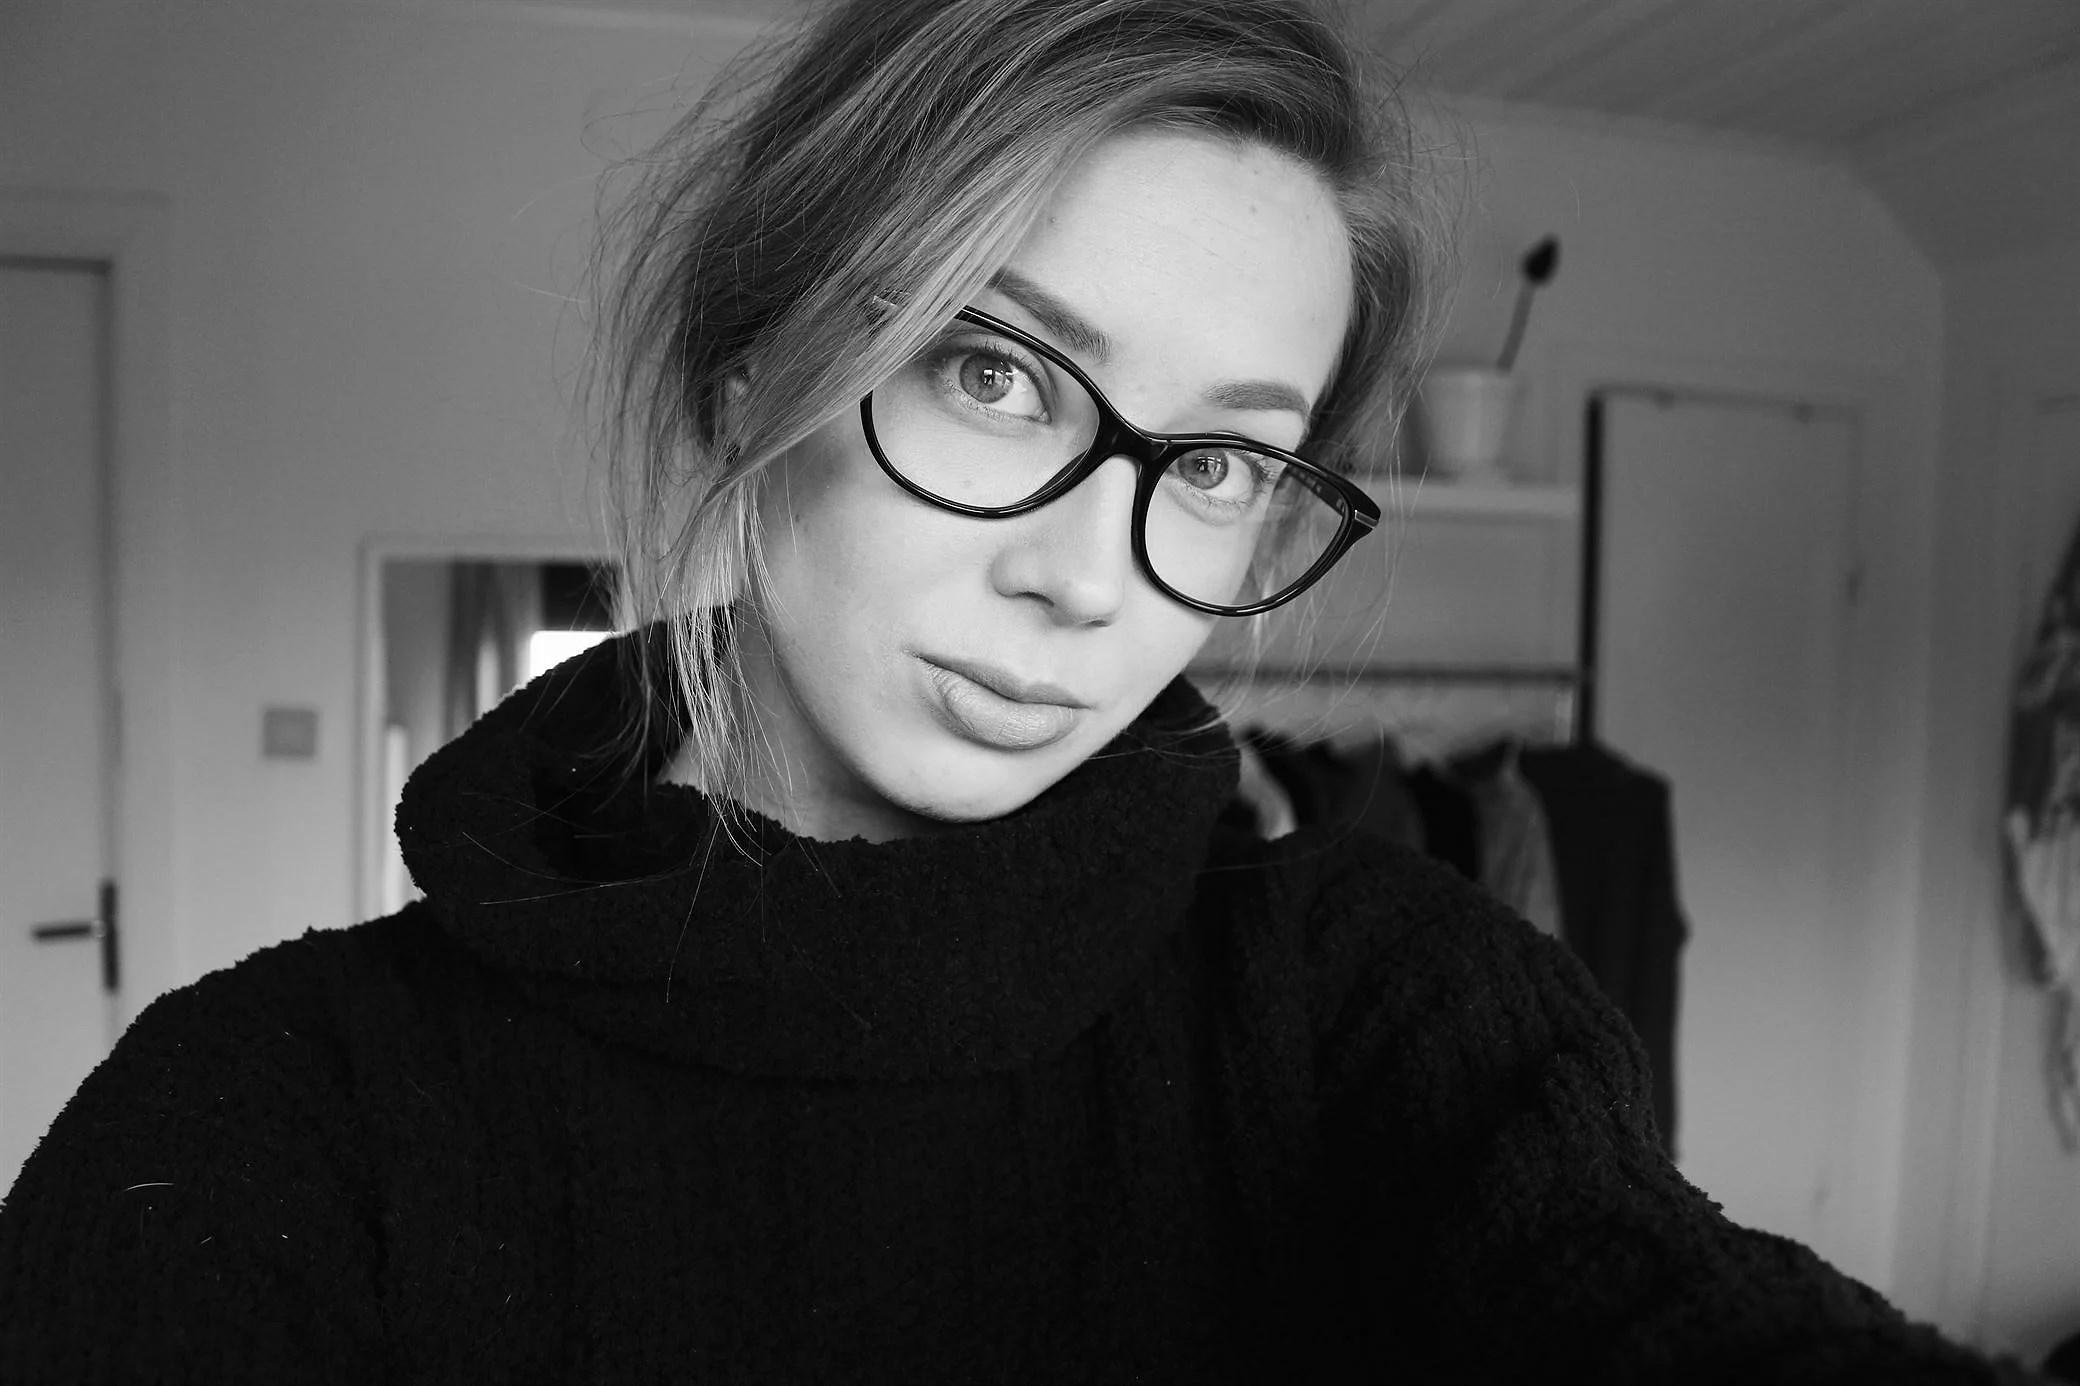 Mina nya glasögon